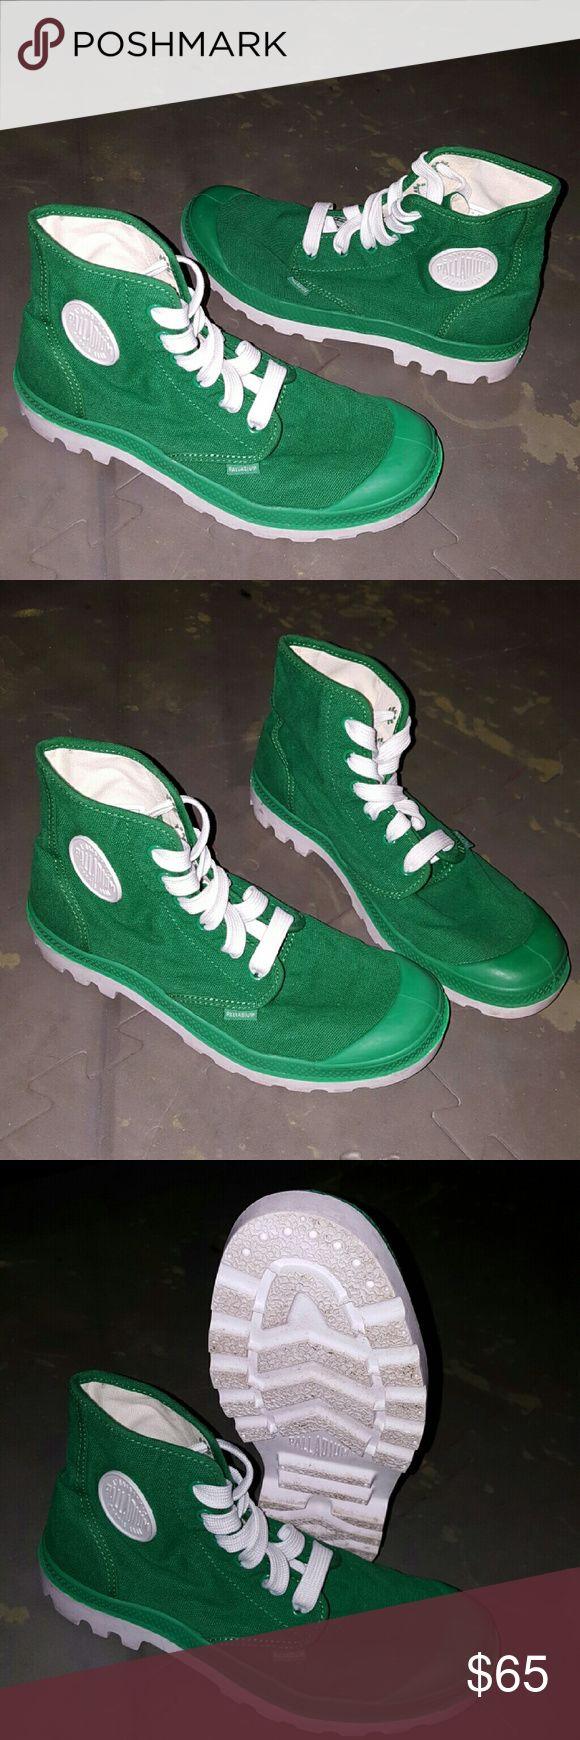 Palladium Boots Size 7 mens Palladium Shoes Boots